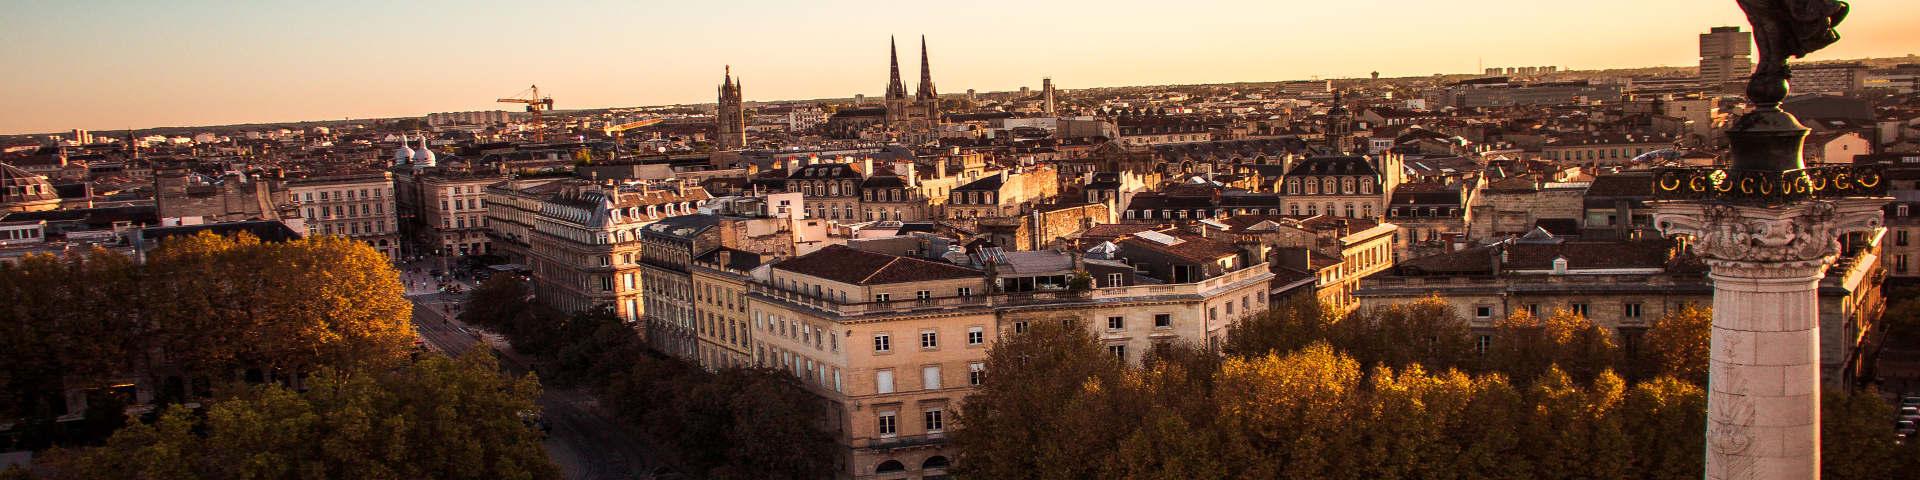 Bordeaux hero banner 1